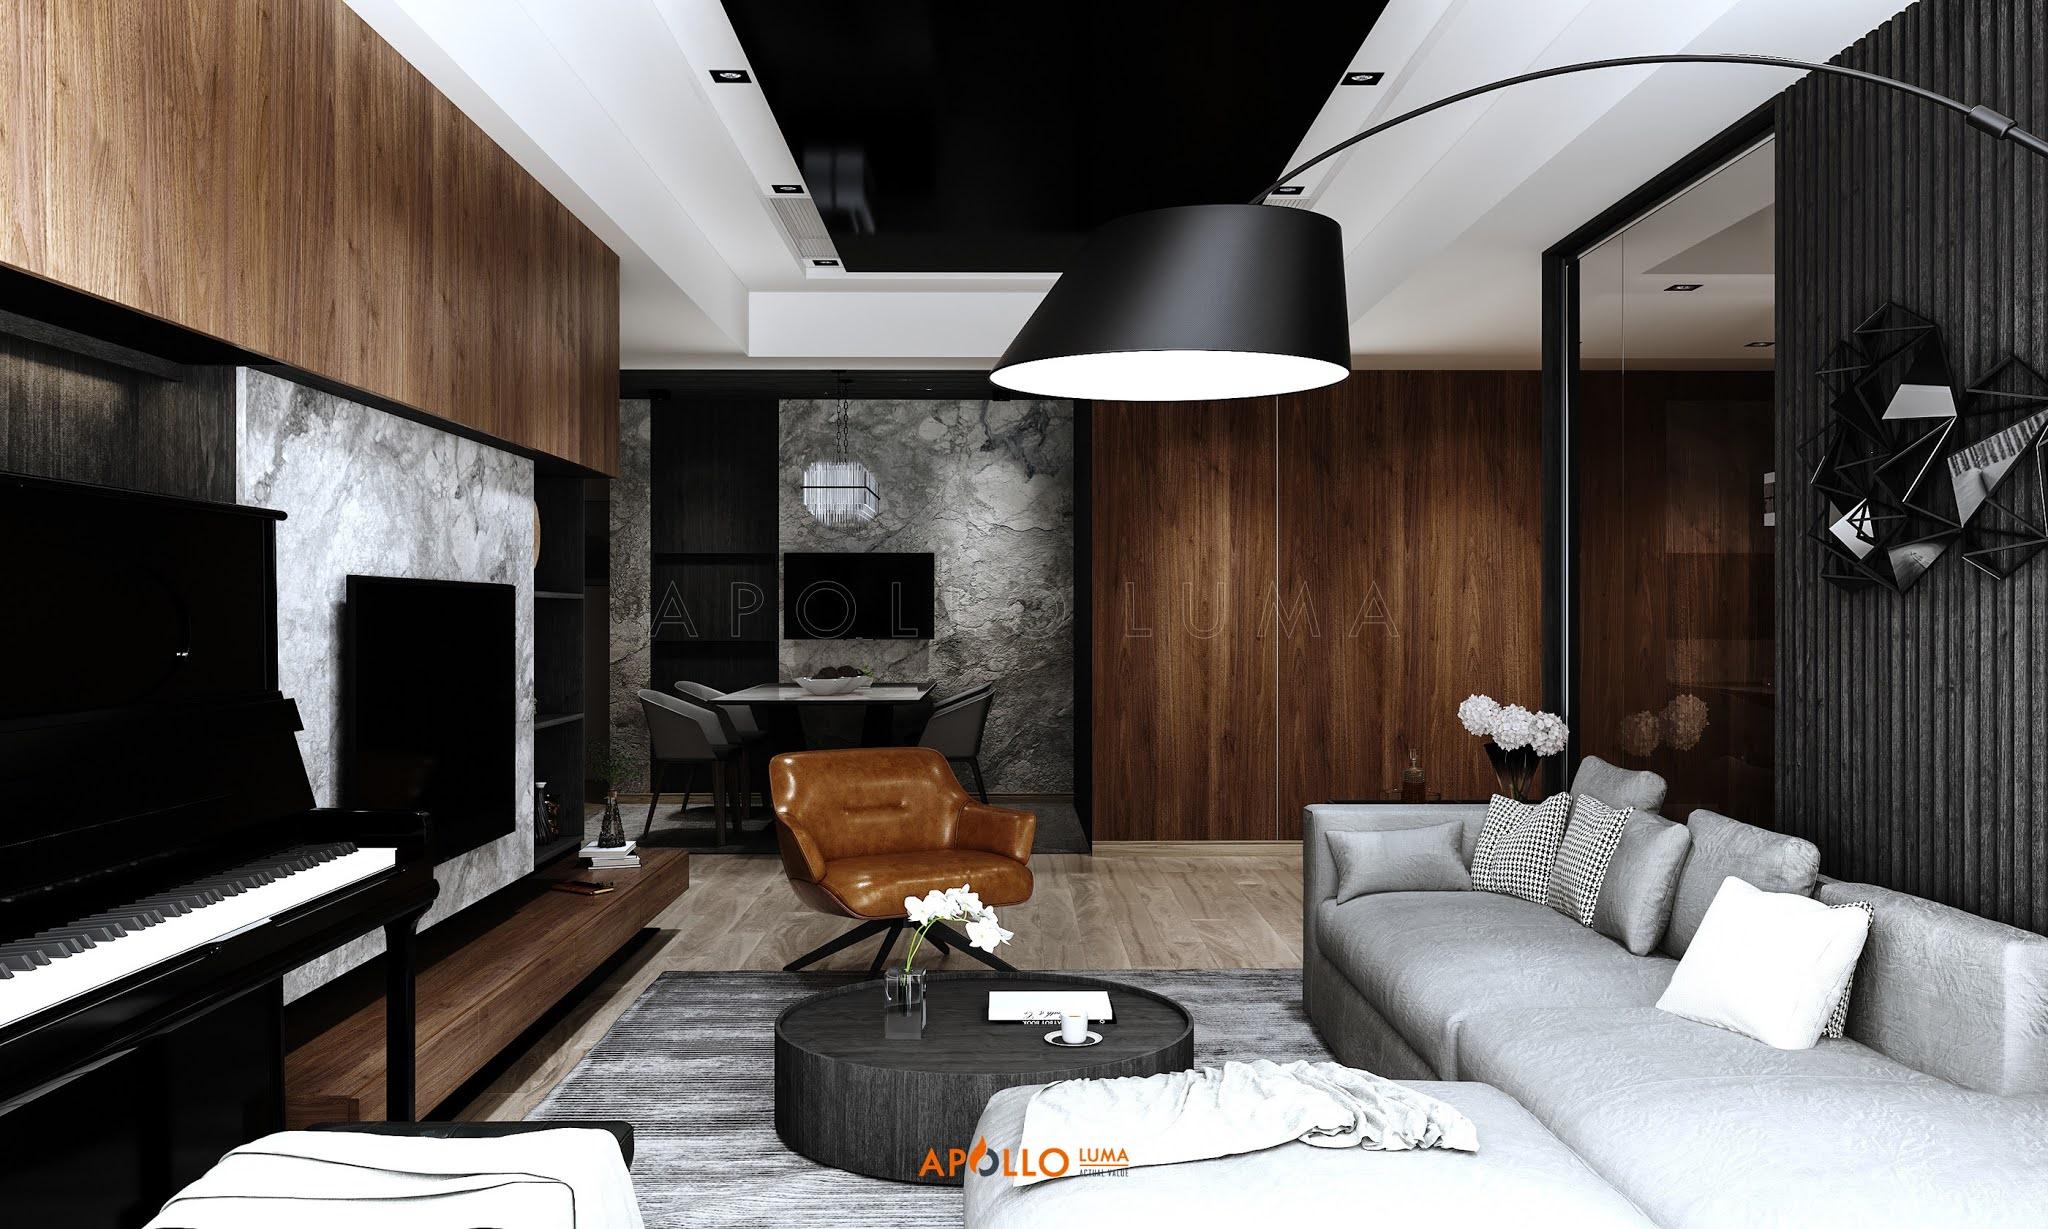 Thiết kế nội thất căn 4PN (145m2) Vinhomes Metropolis Liễu Giai